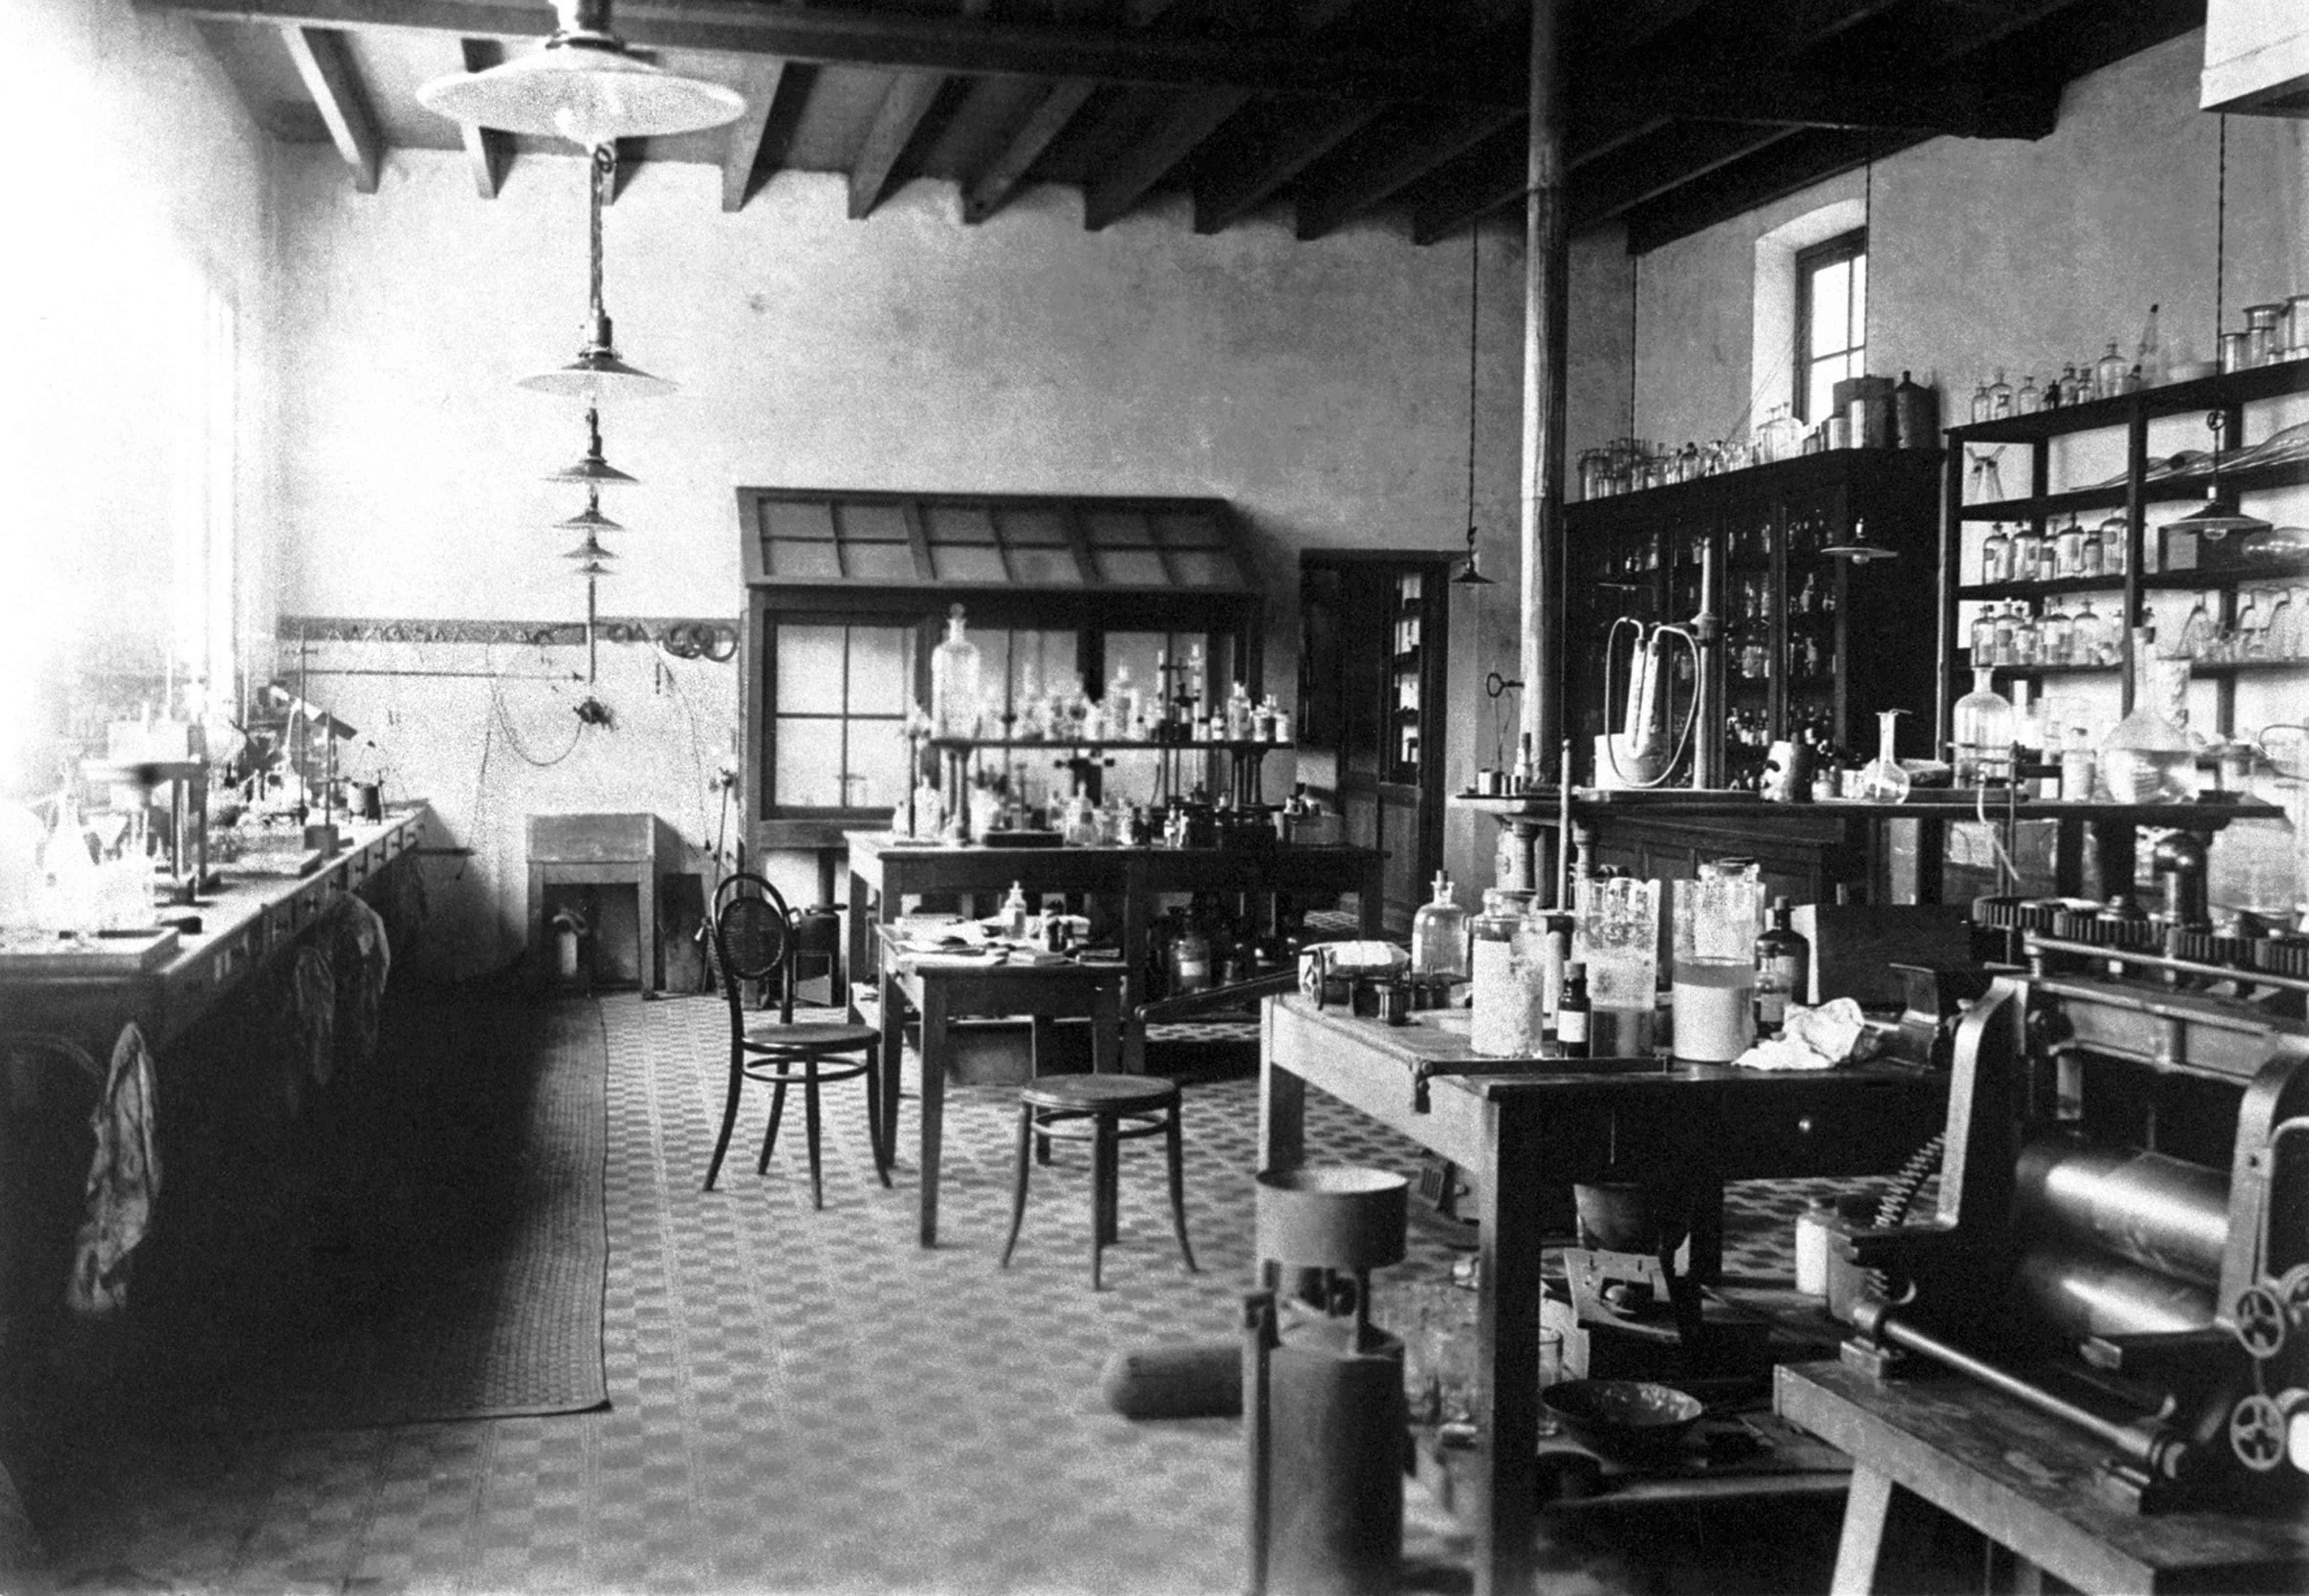 Laboratorium of Alfred Nobel at his Villa in Sanremo, 1890s